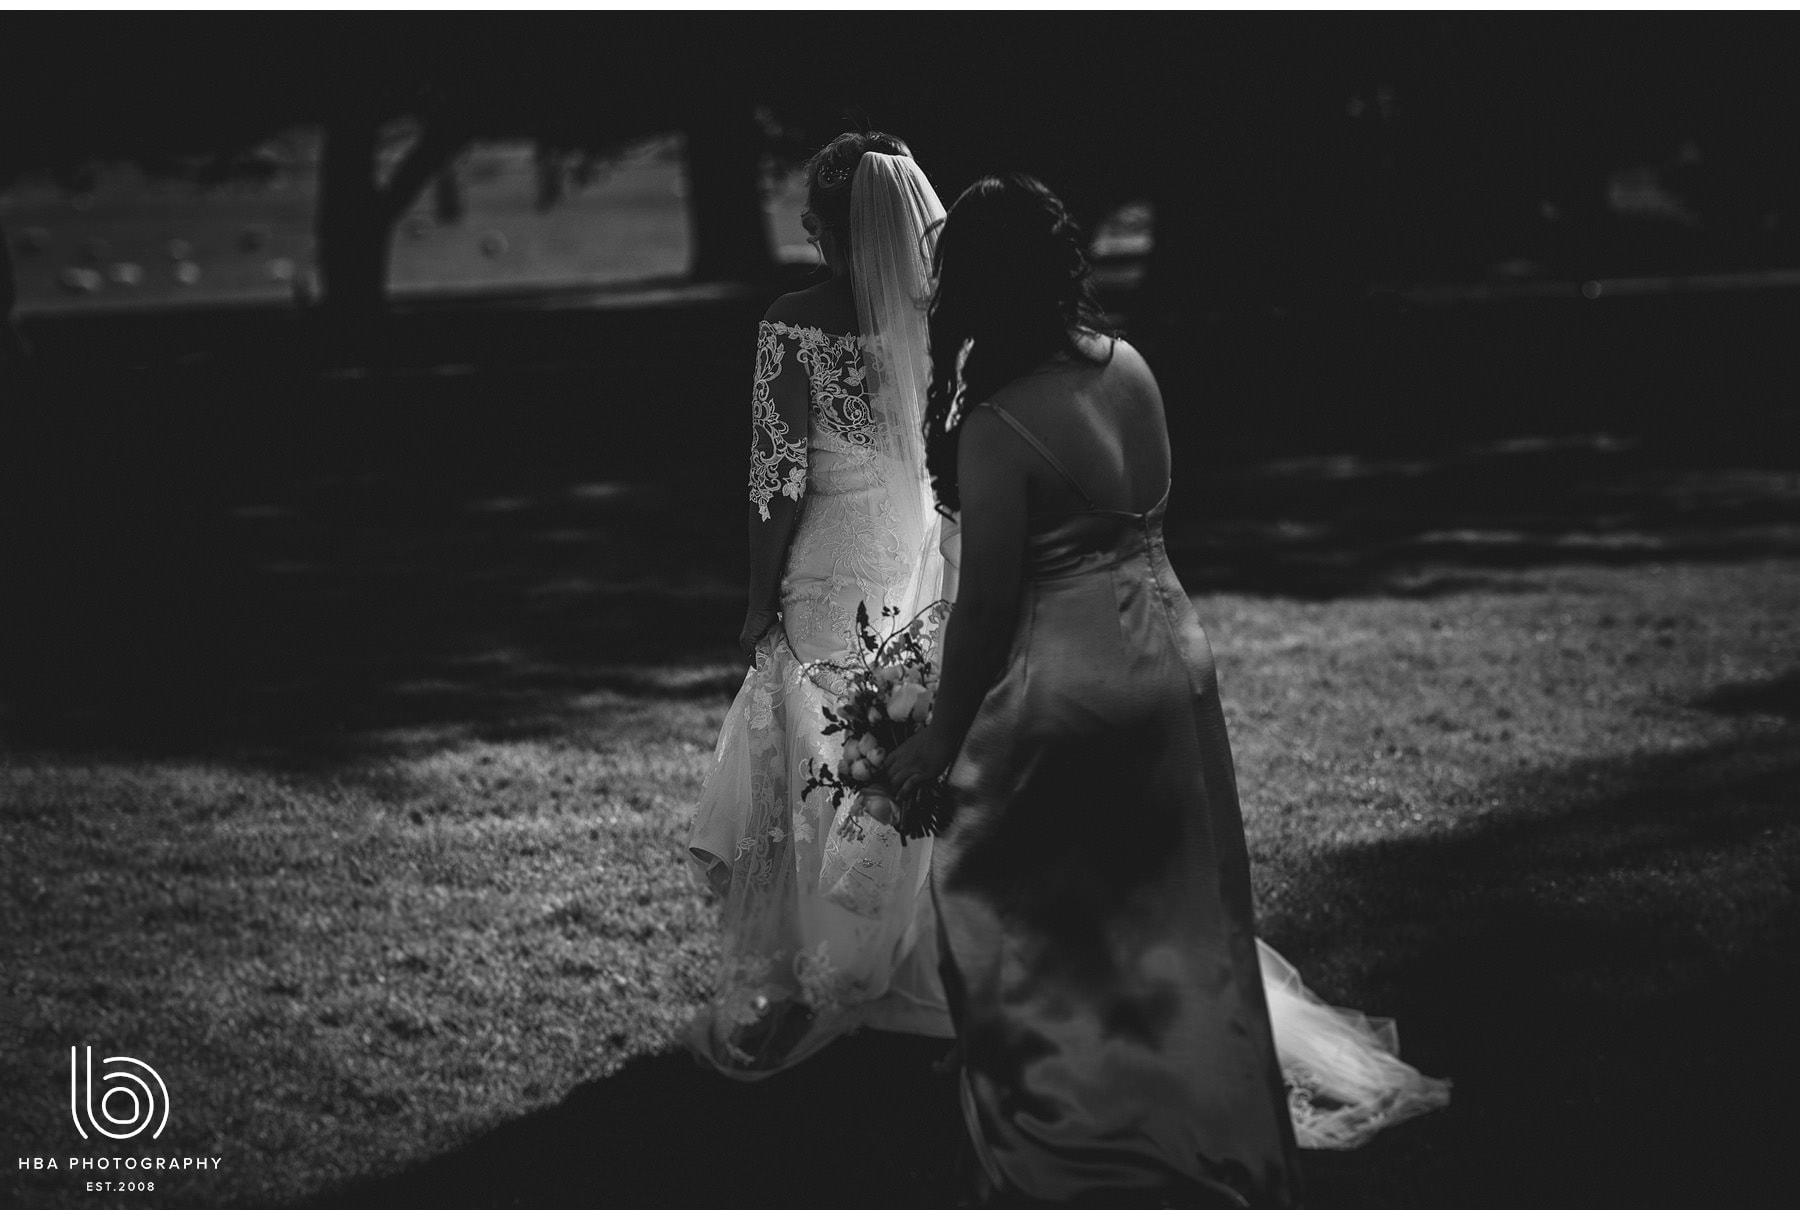 the bride walking at Stapleford park